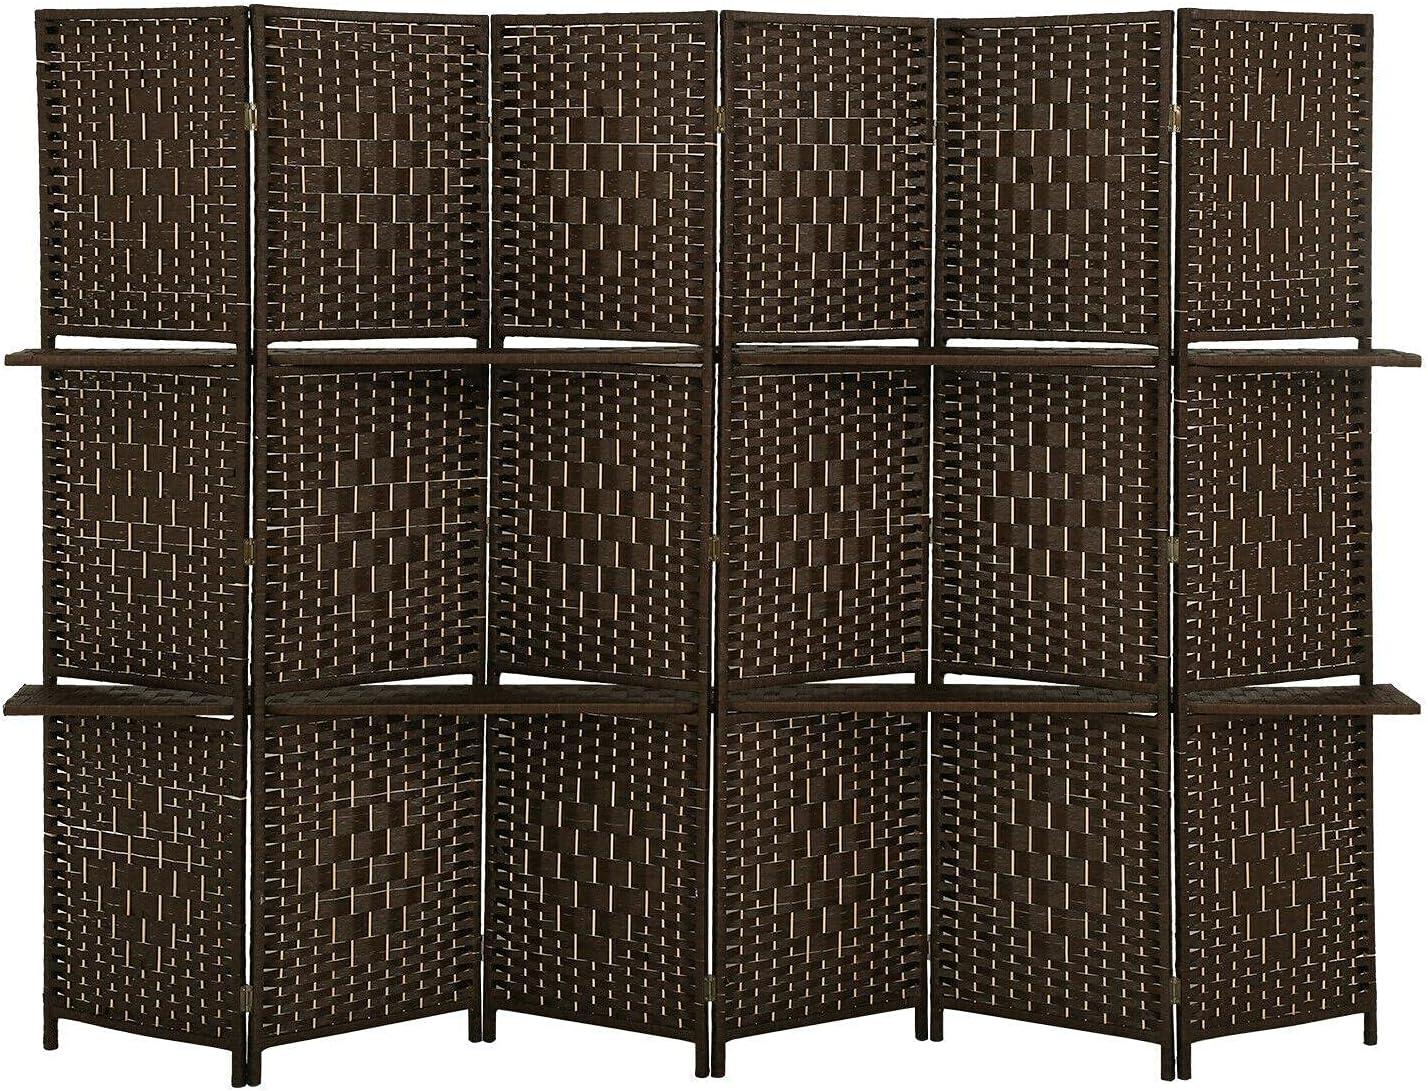 Room Divider 6 Panel Regular store Screen P Wooden 2021 Folding